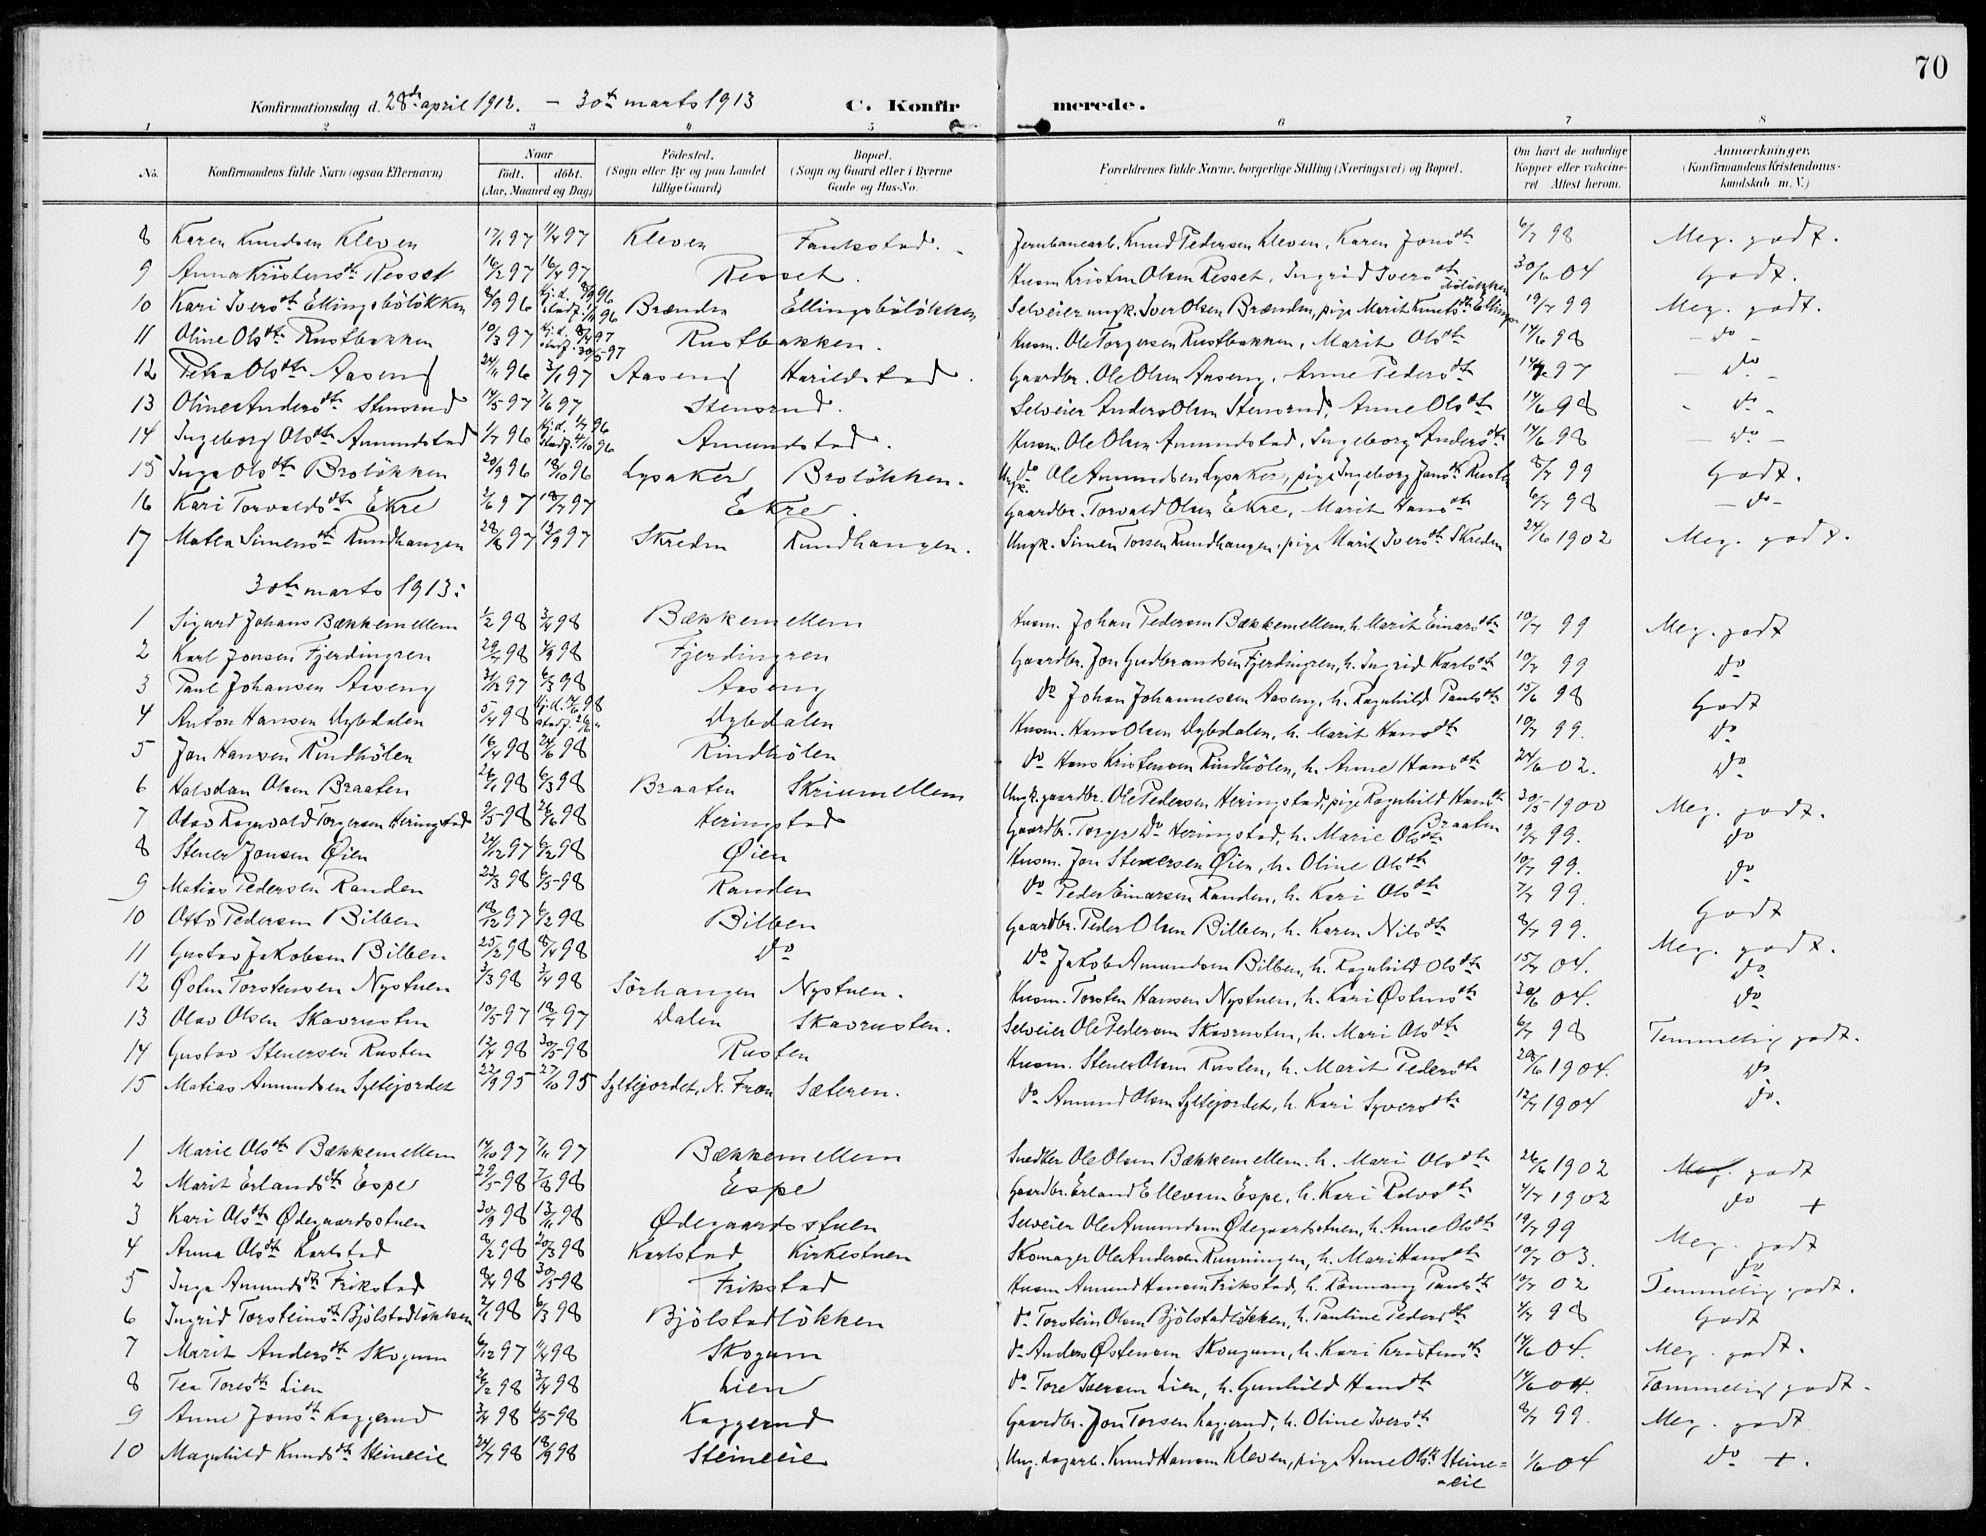 SAH, Sel prestekontor, Ministerialbok nr. 1, 1905-1922, s. 70